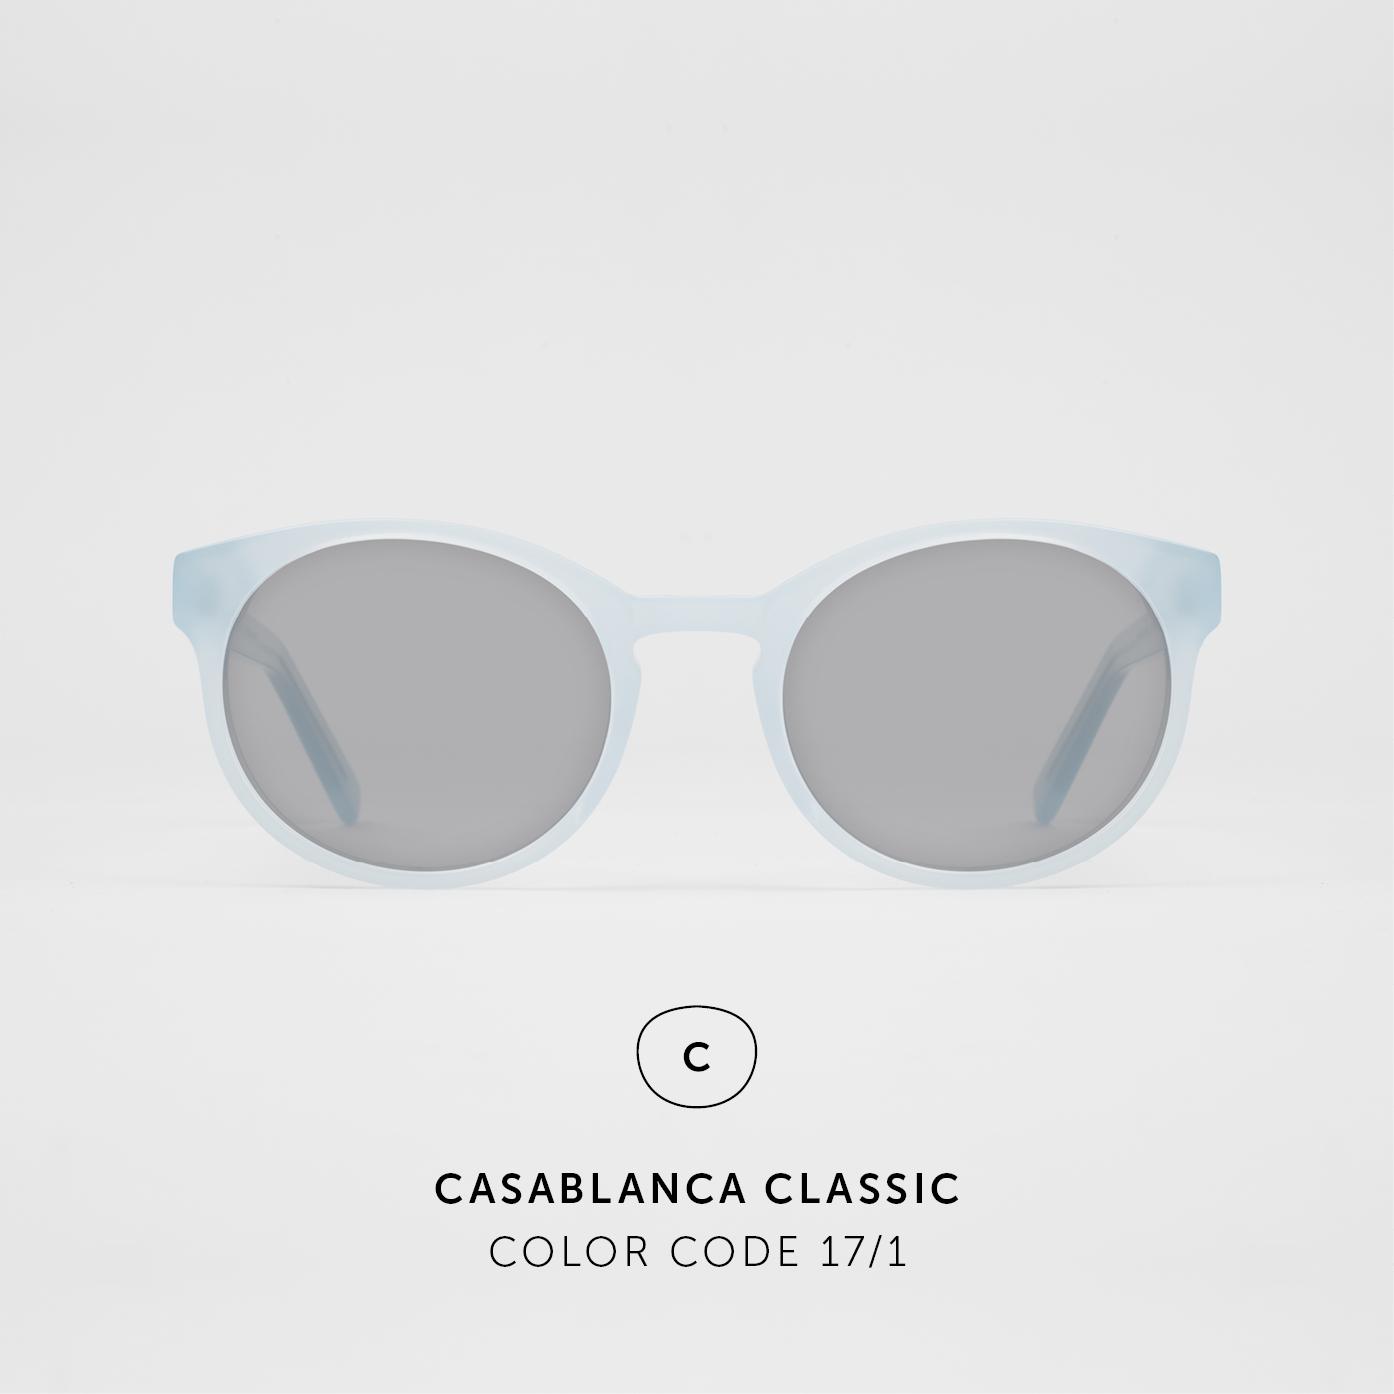 CasablancaClassic52.jpg